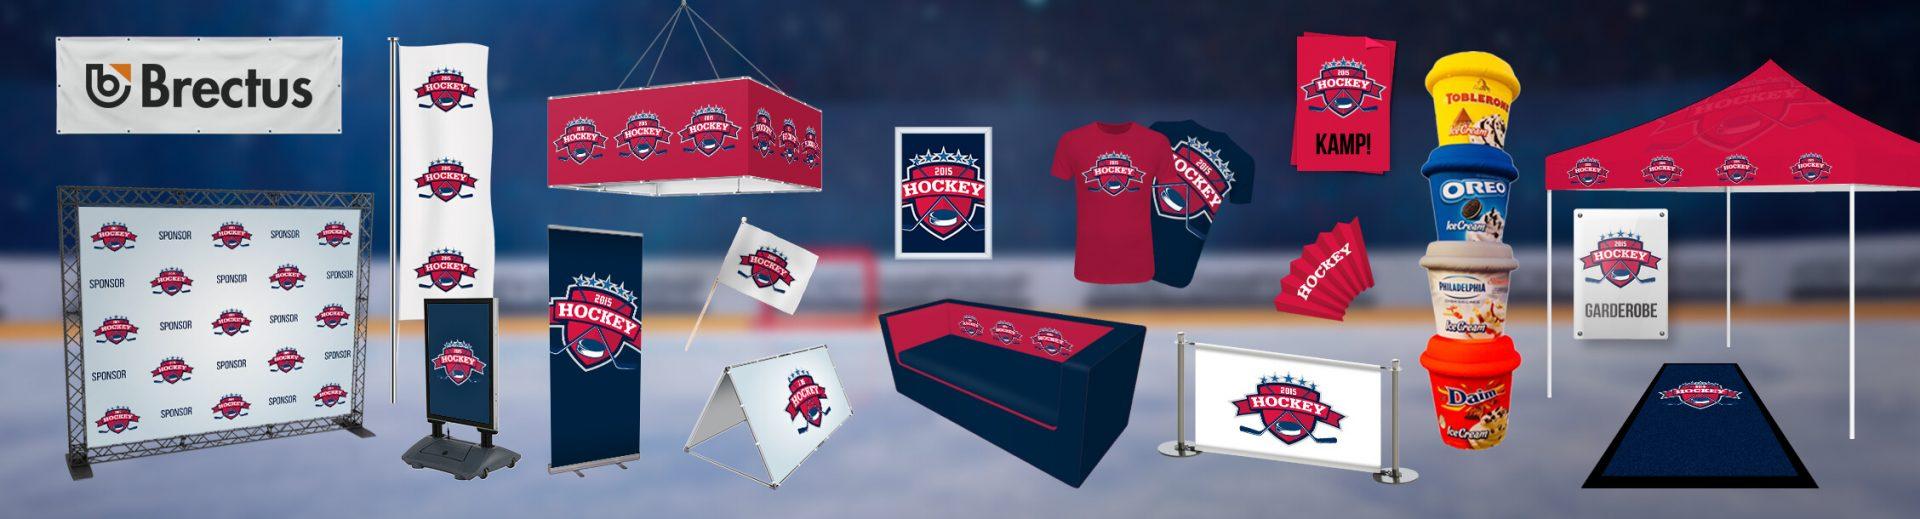 Ishockey Brectus Arena Reklame